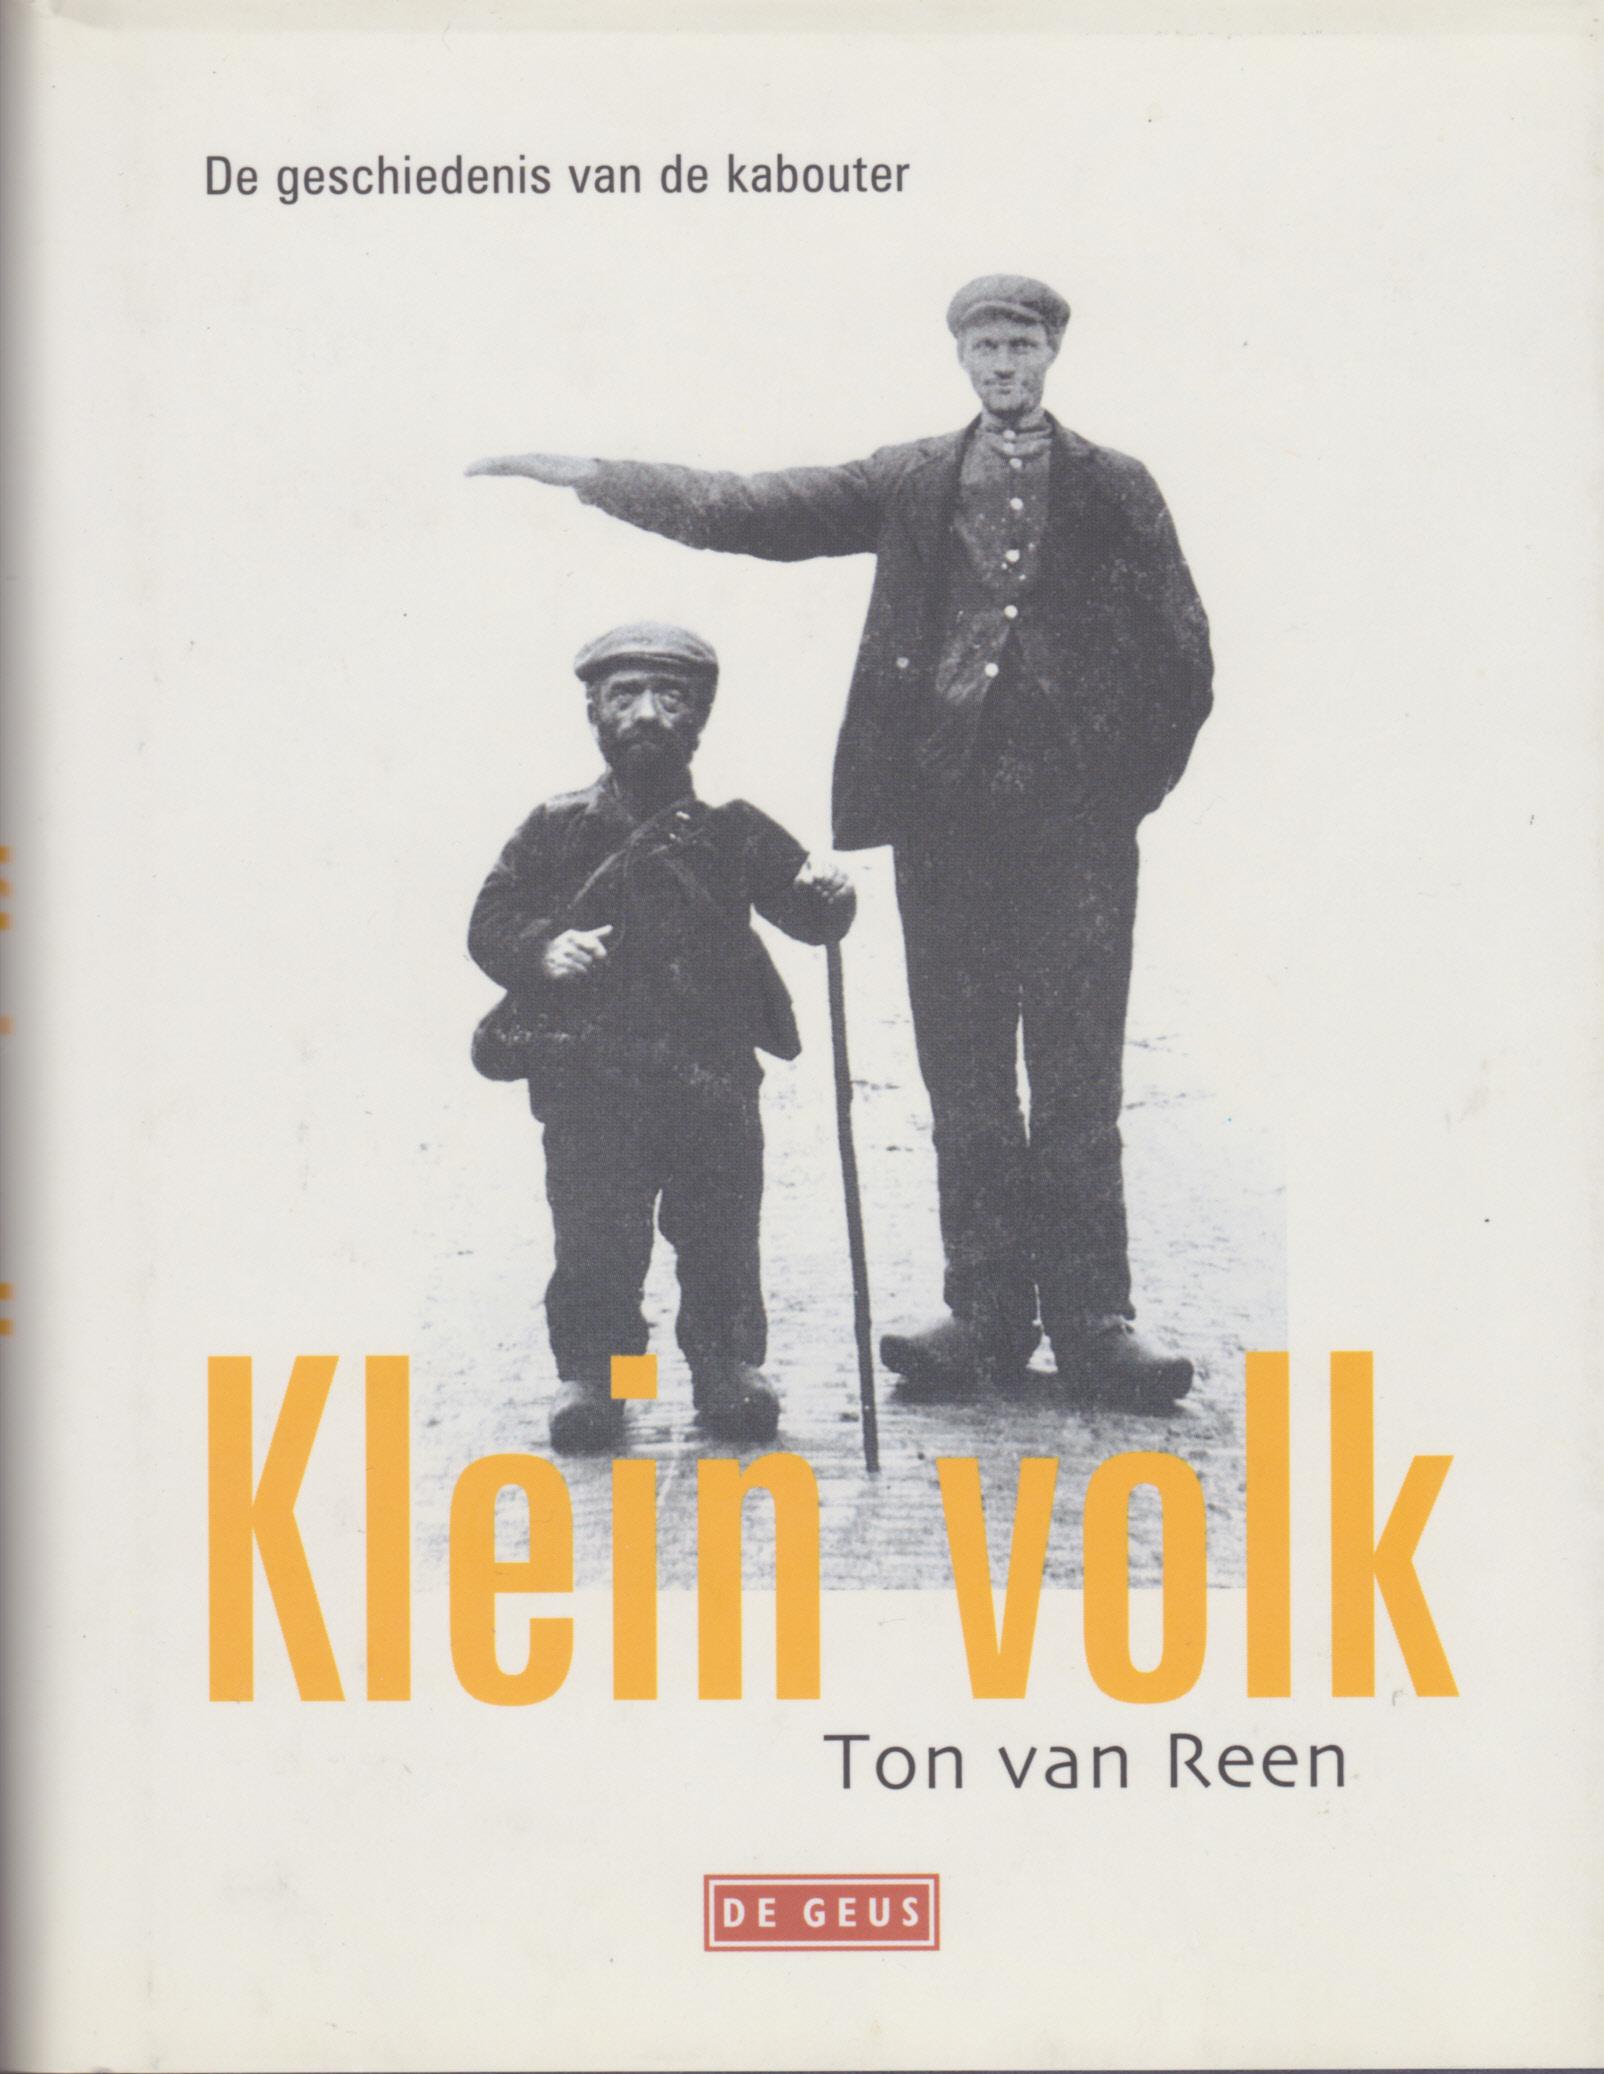 Klein Volk, Ton van Reen, Kabouters